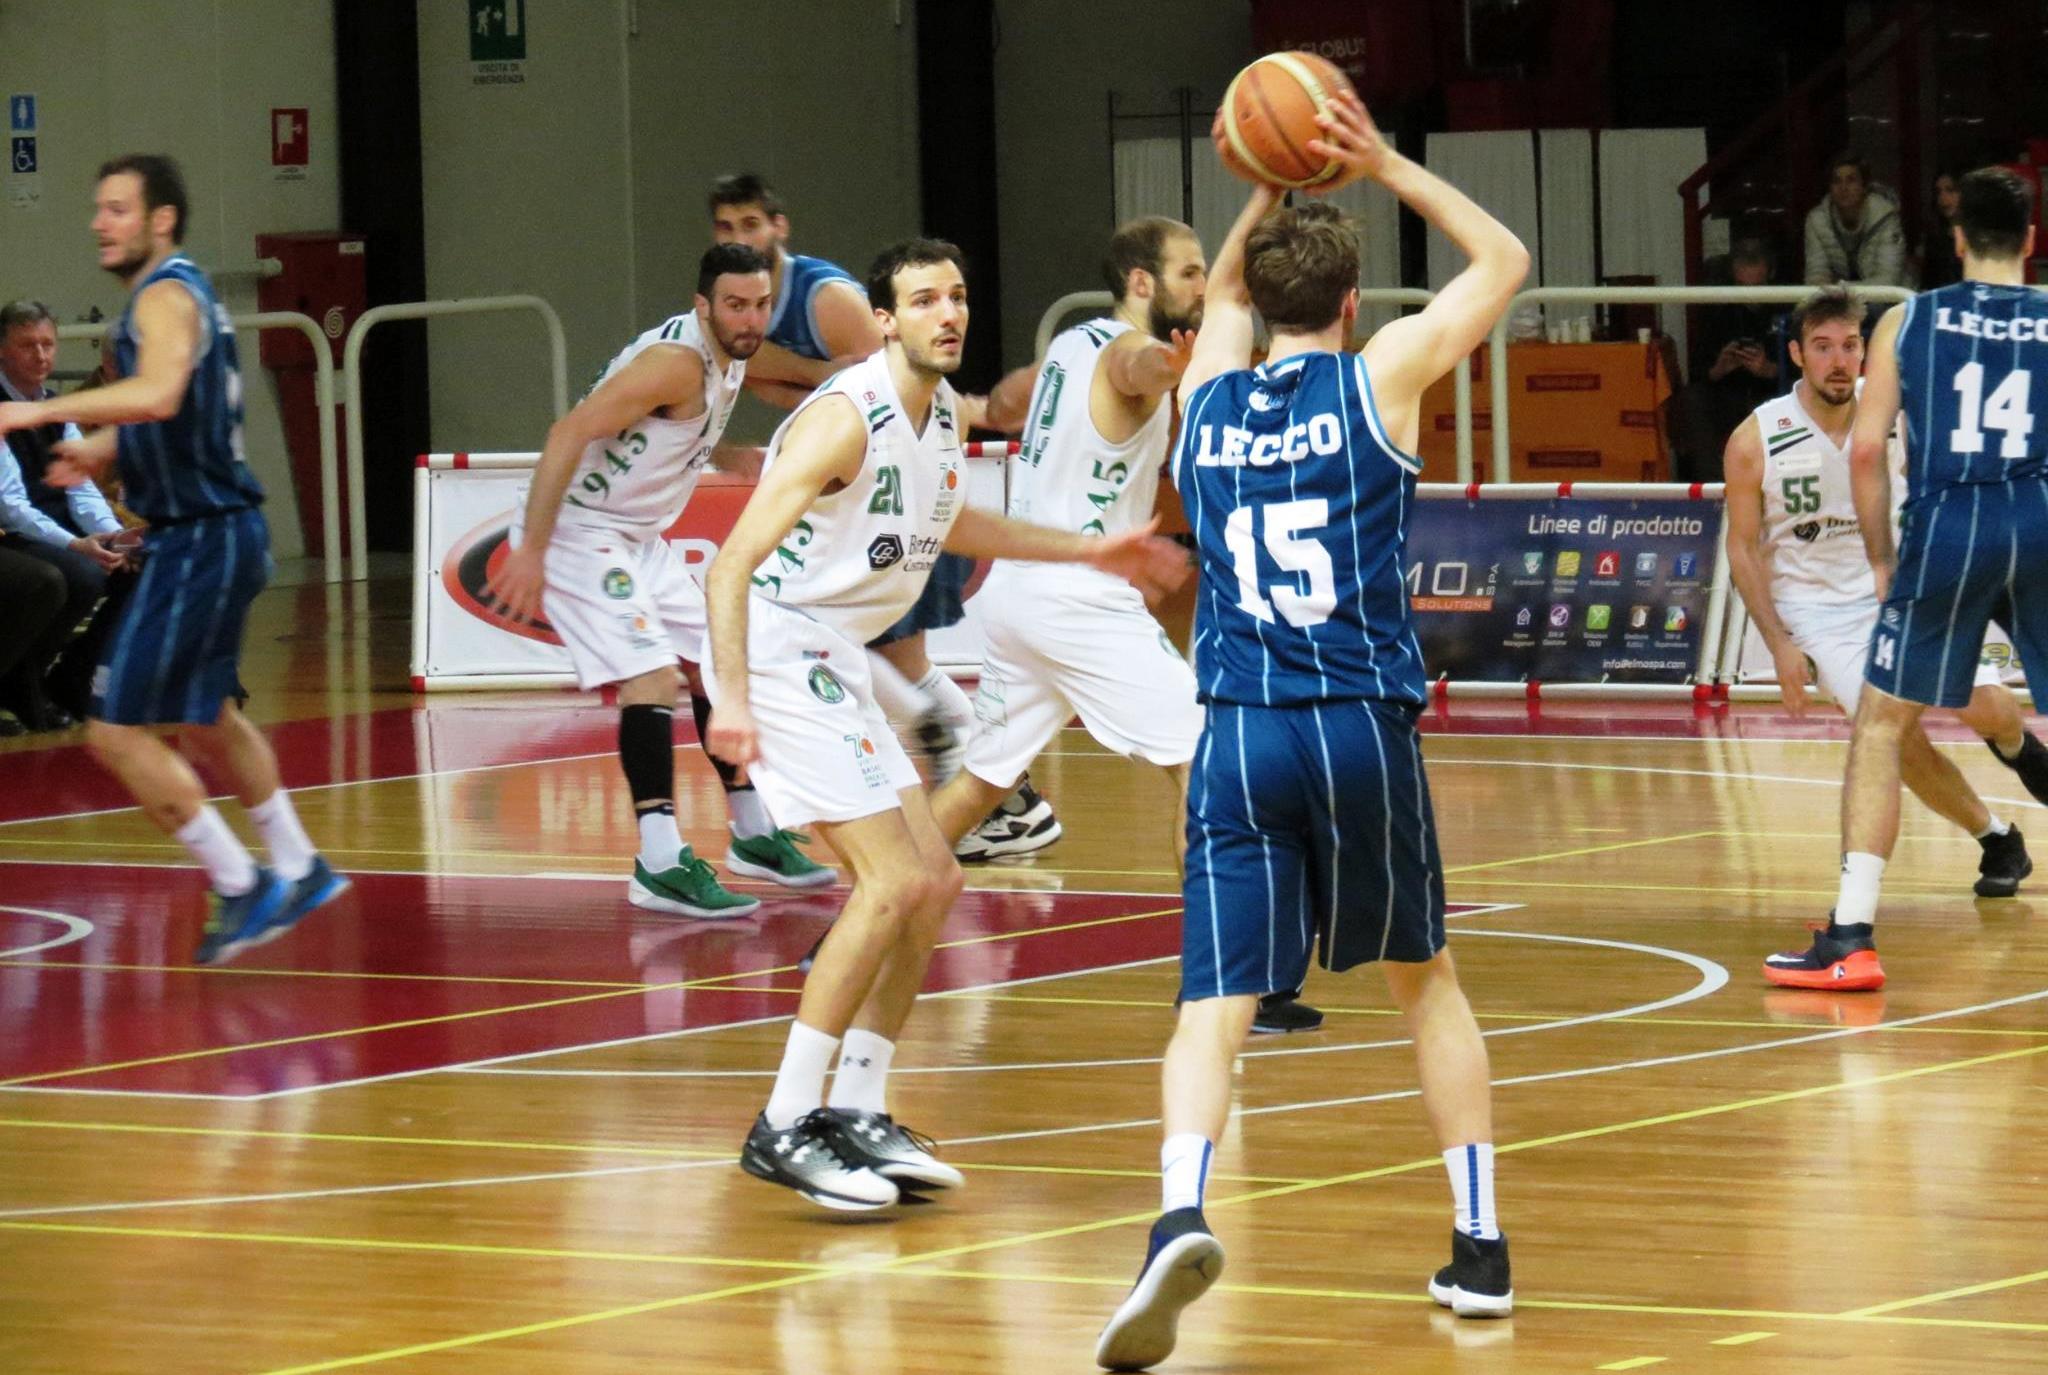 Basket Padova Lecco (1)